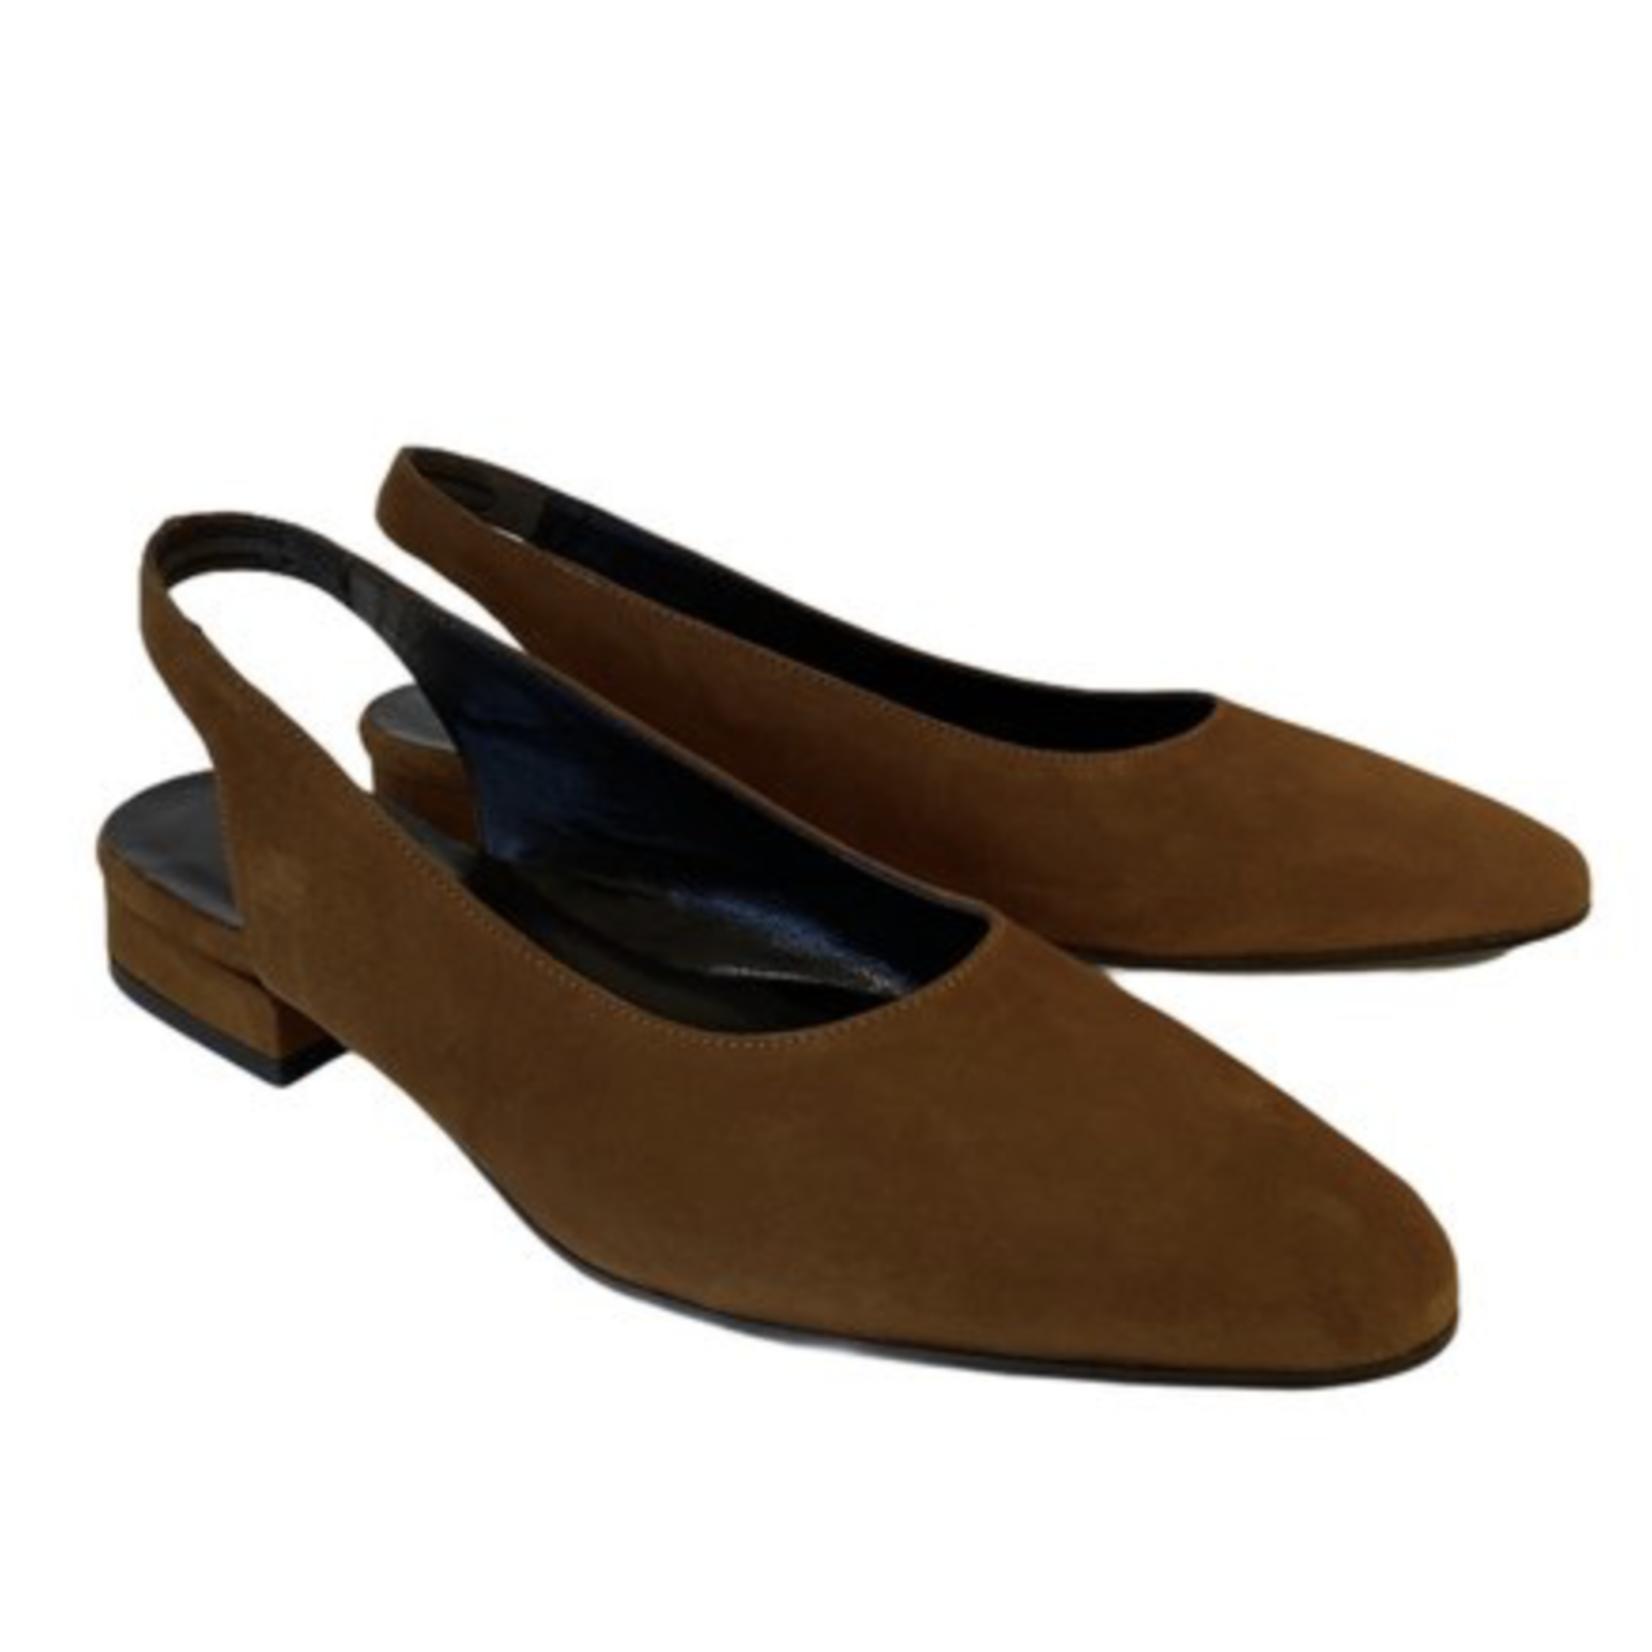 Panara Open loafer